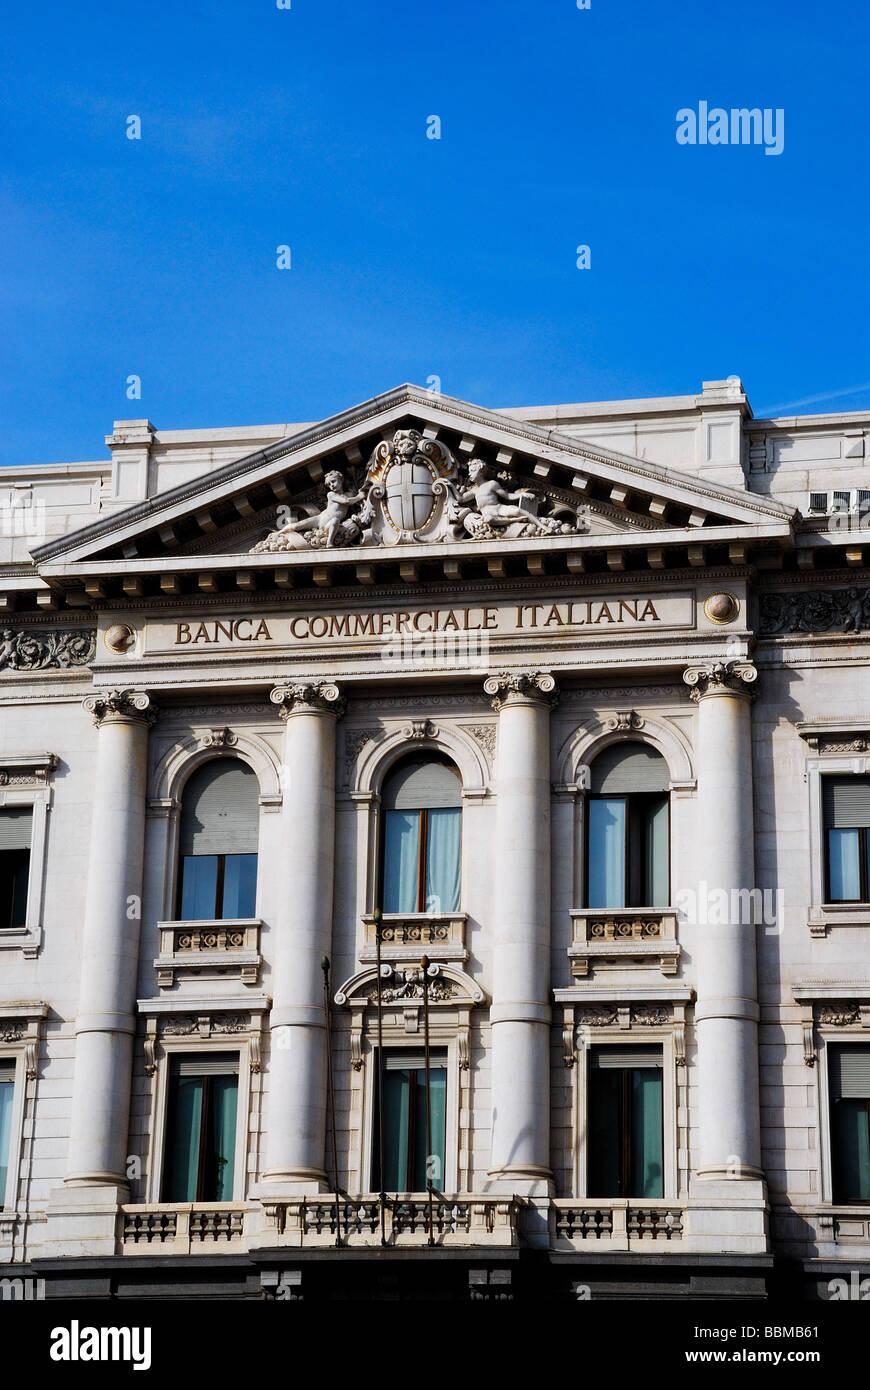 Italia, Milán, Banca Commerciale Italiana BCI Imagen De Stock